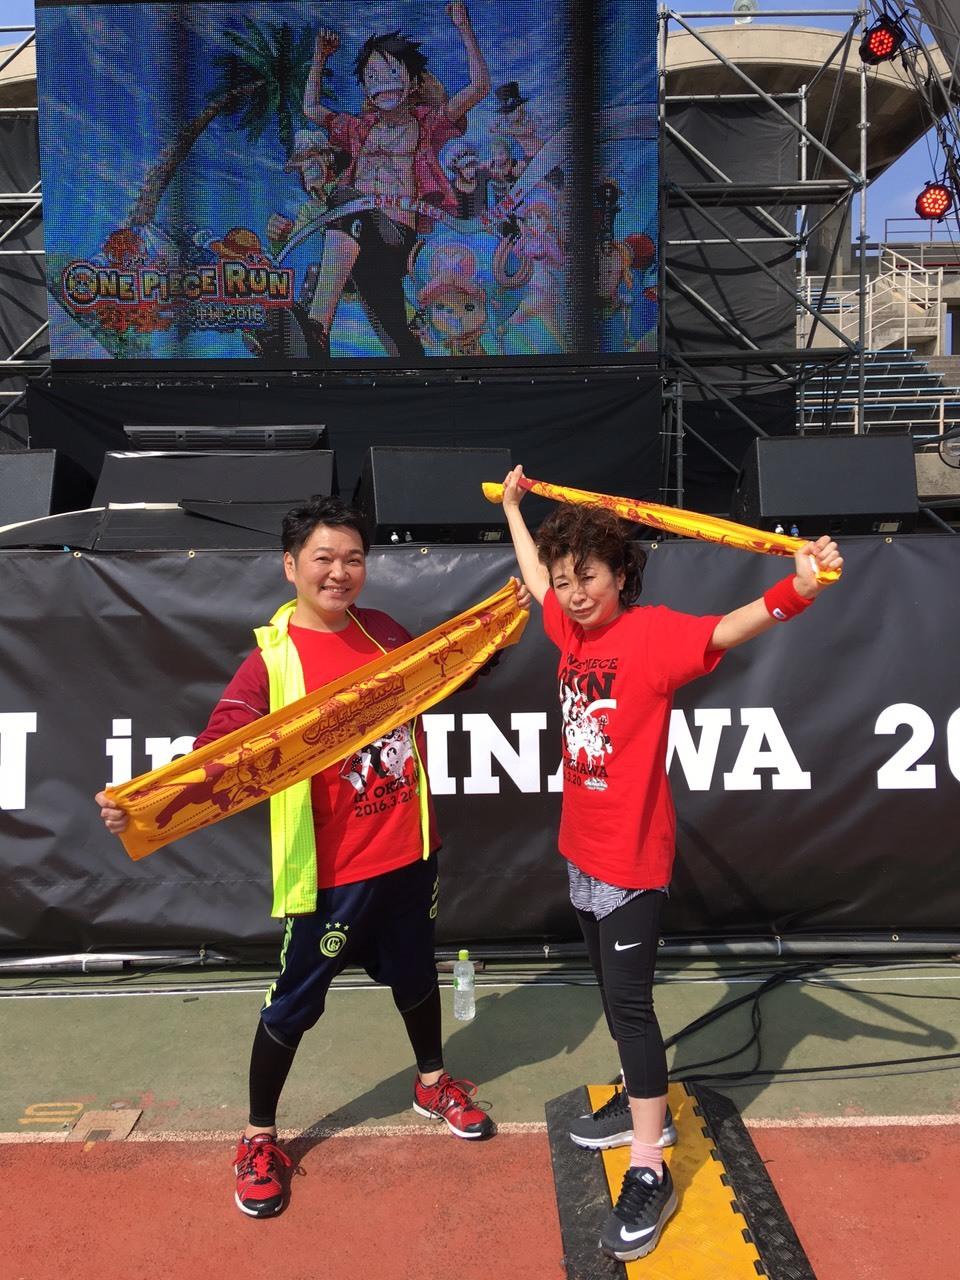 ONE PIECE RUN in 沖縄2016_a0163623_21122891.jpg